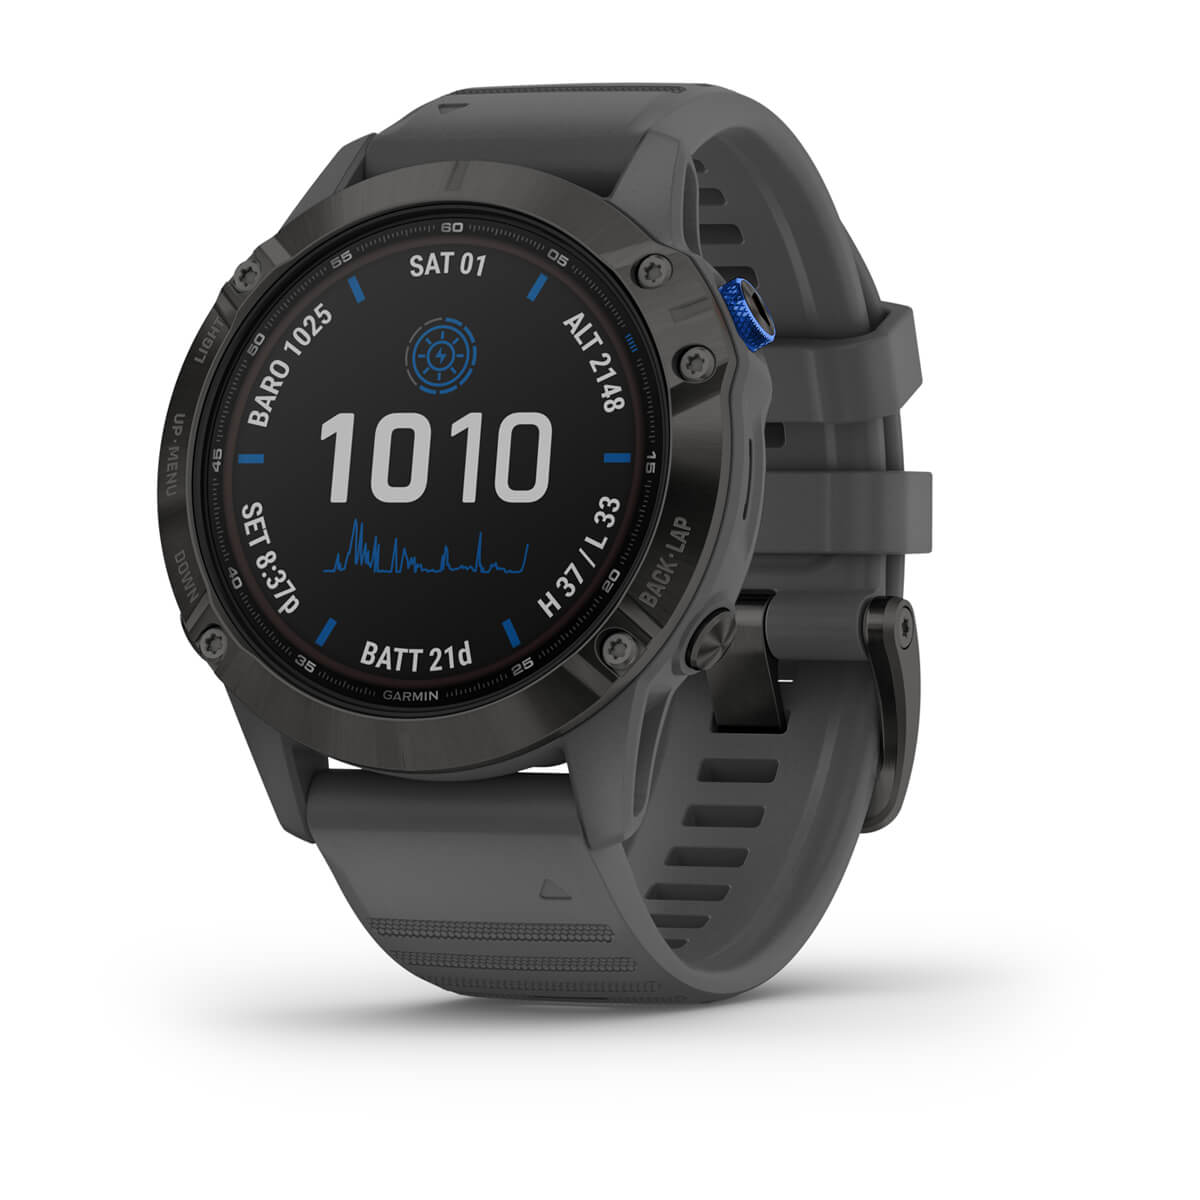 Smartwatch Gps Garmin  Fenix 6 Pro Solar Power Glass Preto com Pulseira Cinza 010-02410-13